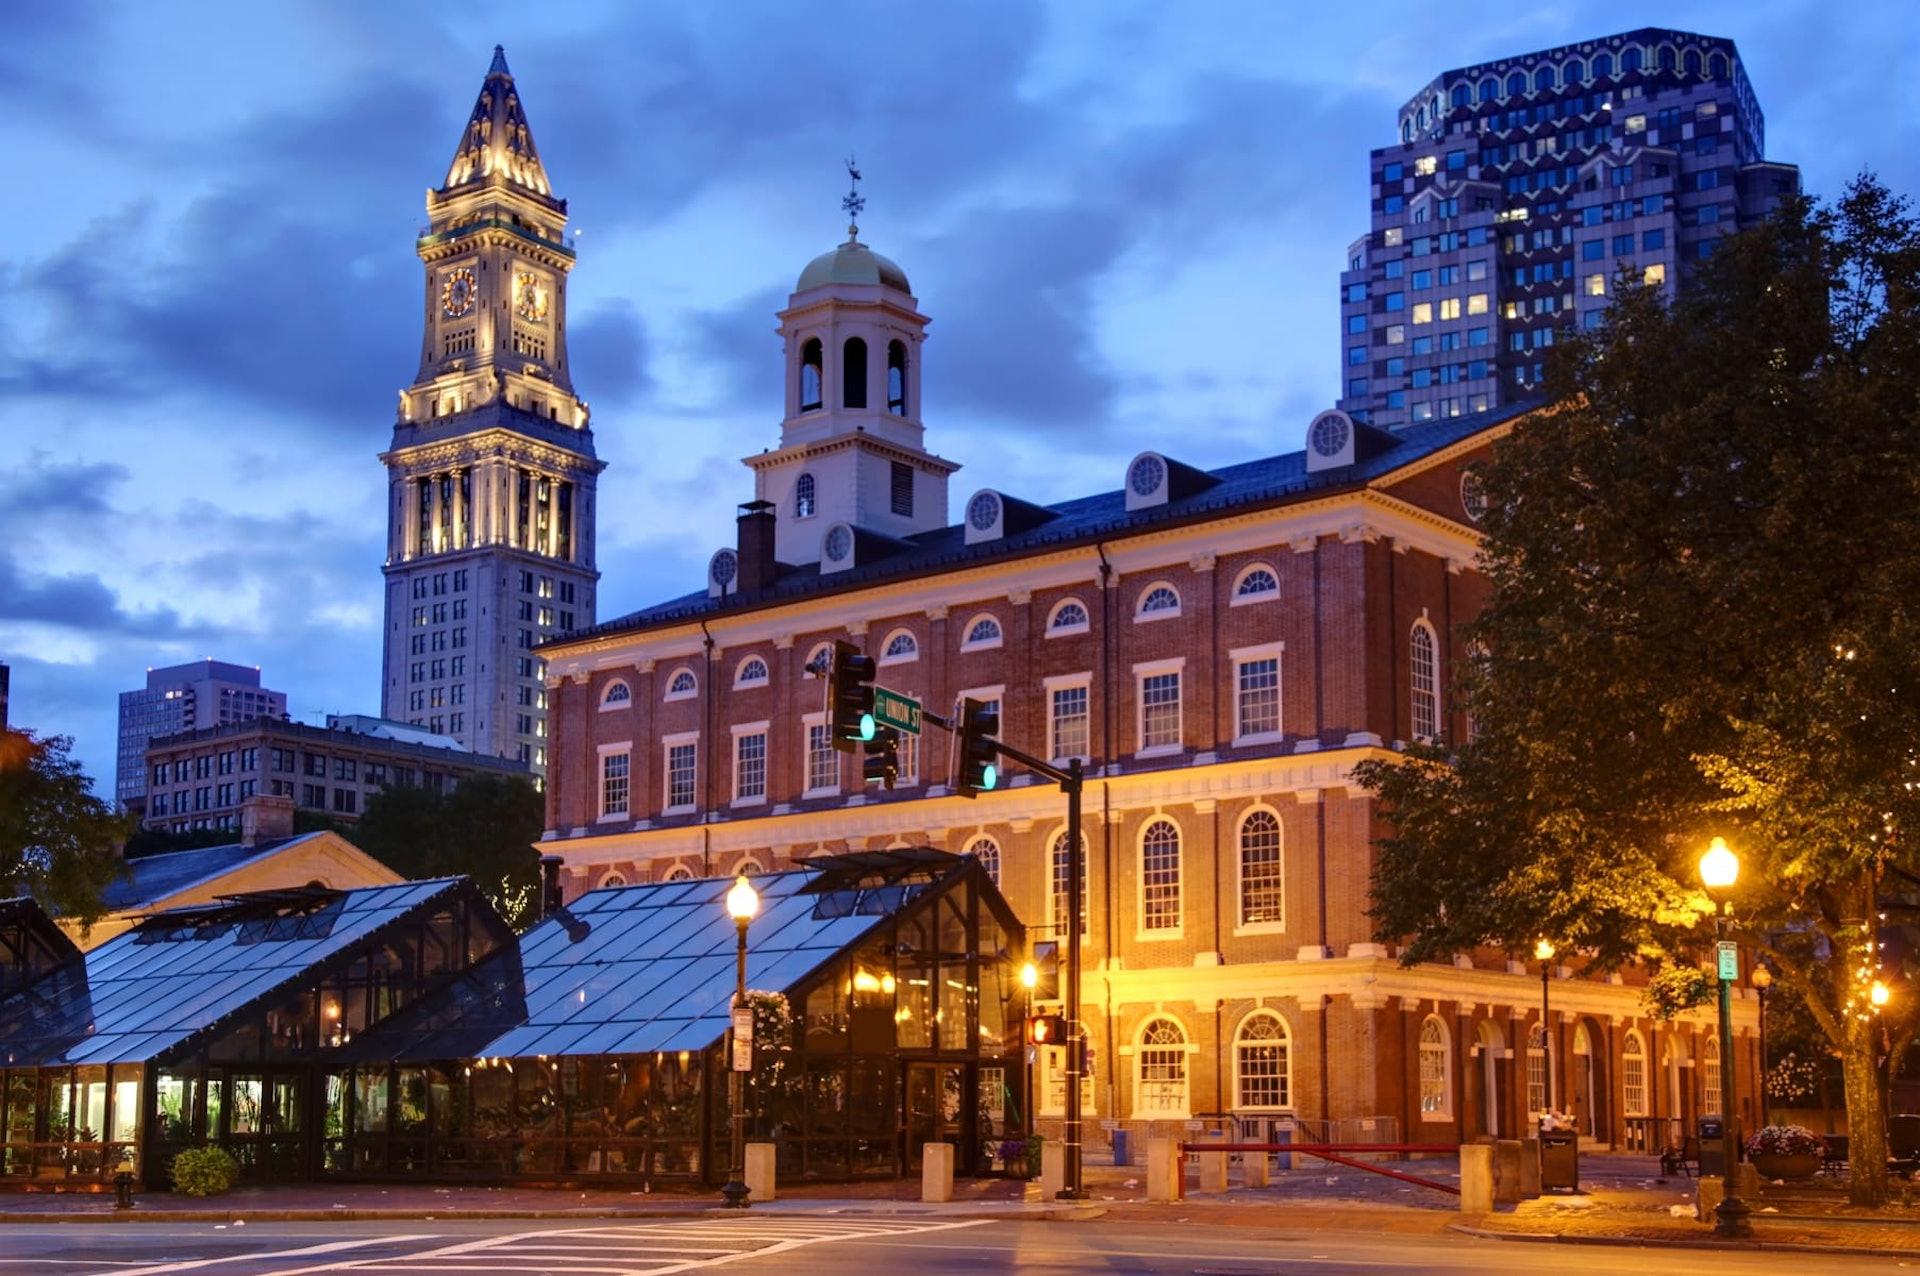 Boston Faneuil Hall exterior at night